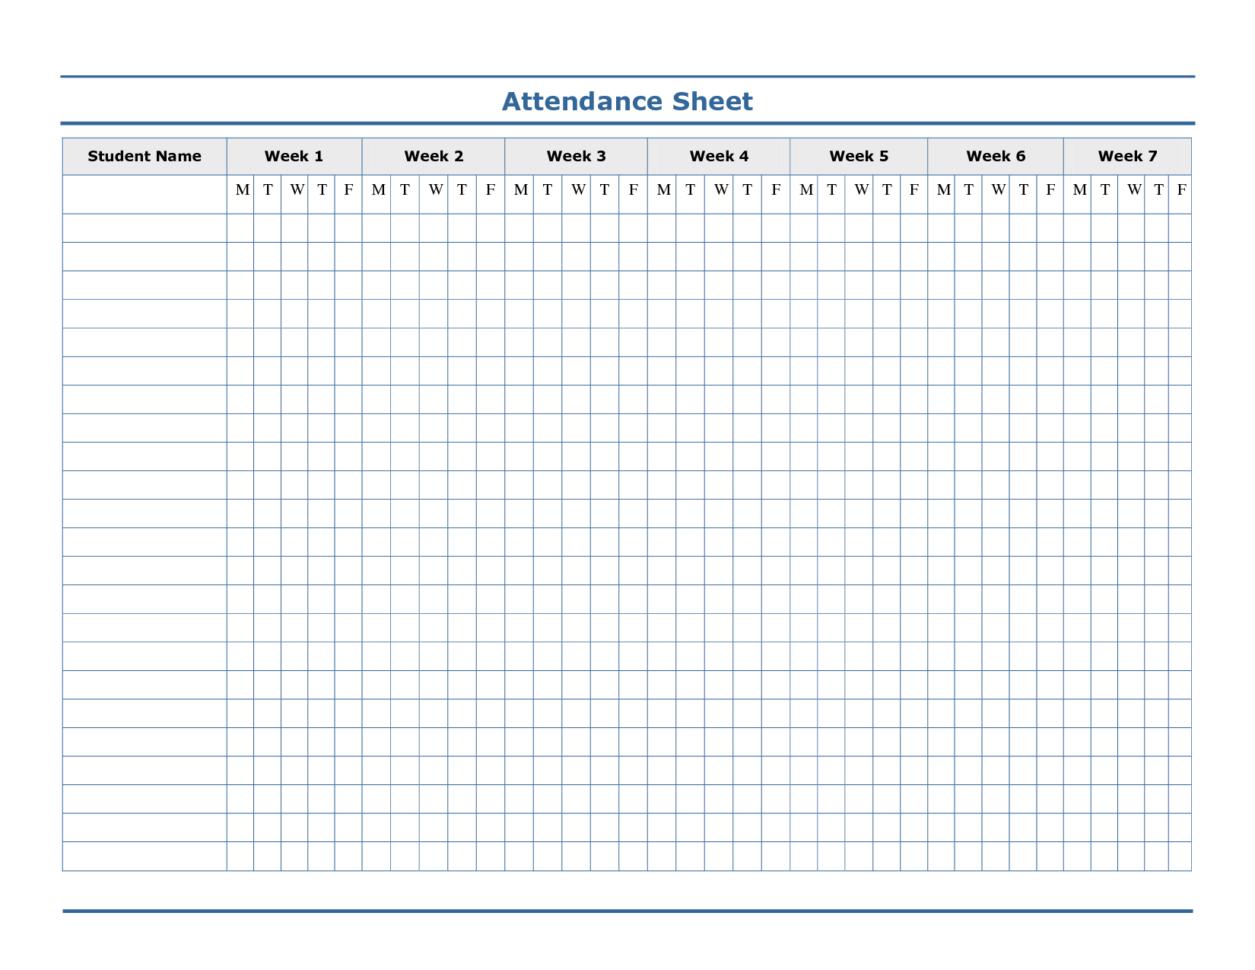 Quickbooks Spreadsheet Templates With Regard To Quickbooks Invoice Templates Free Download  Tagua Spreadsheet